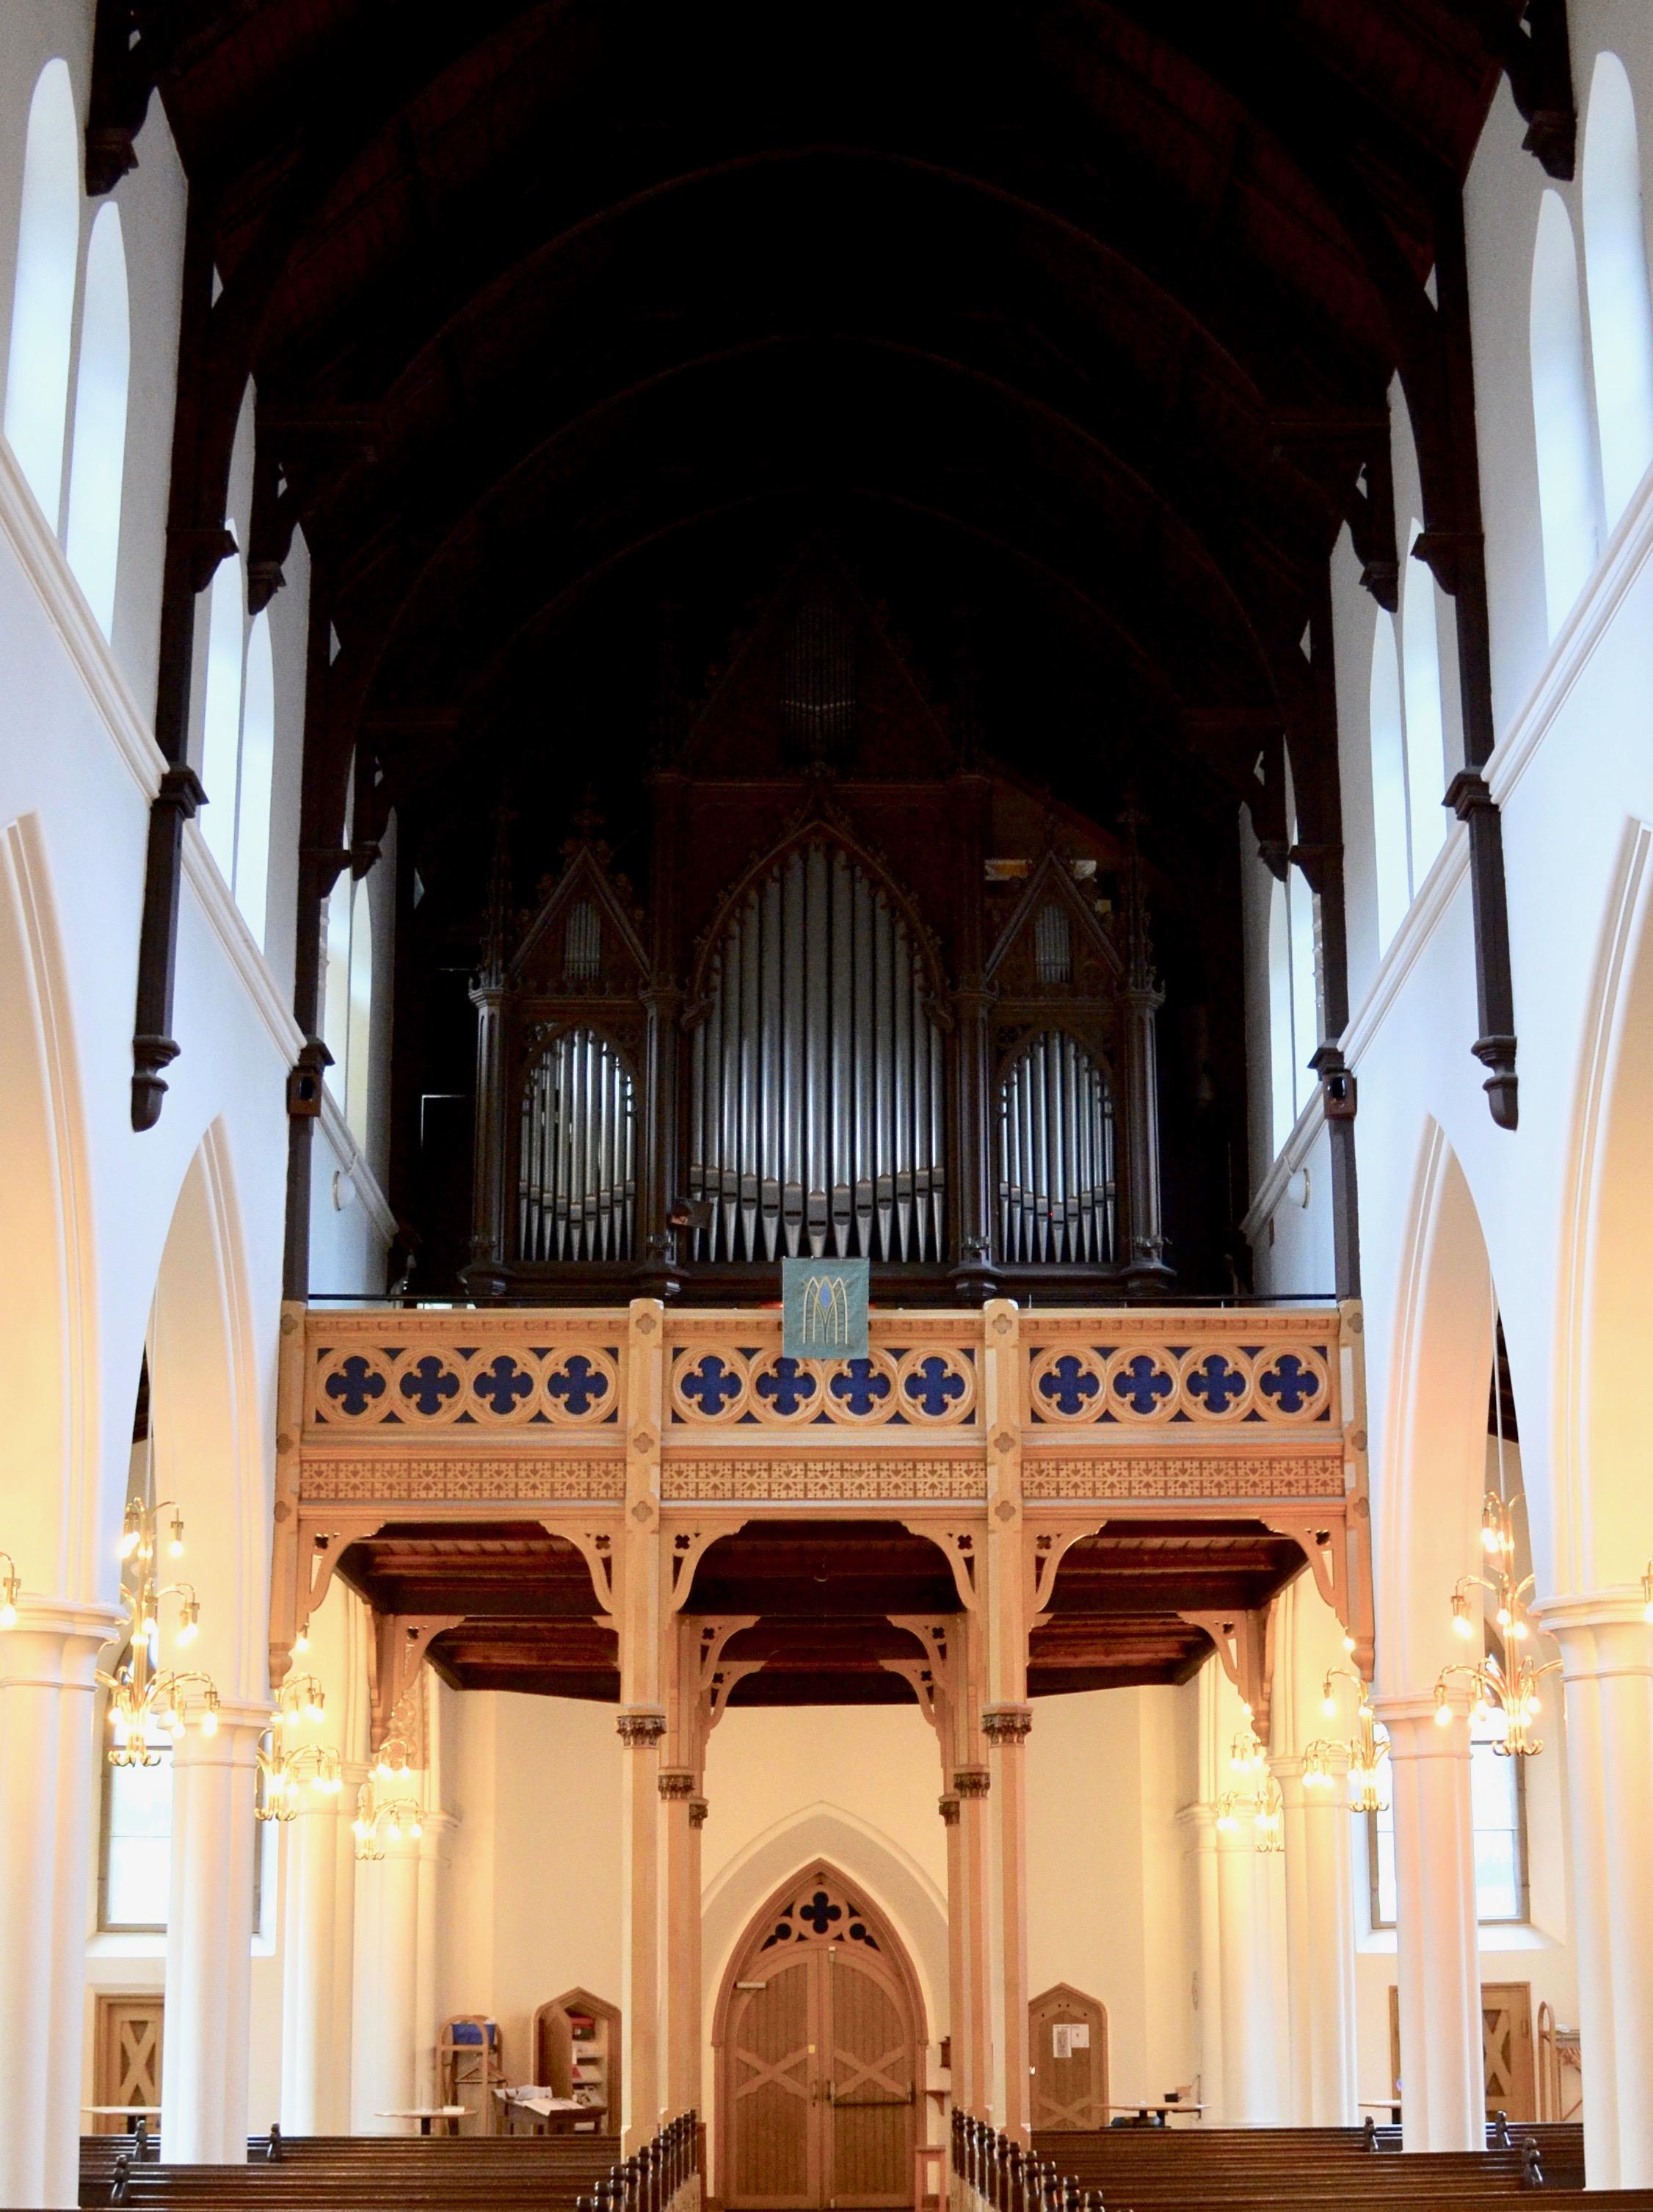 1861 Marcussen & Søn organ in Haga Church, Göteborg, Sweden.